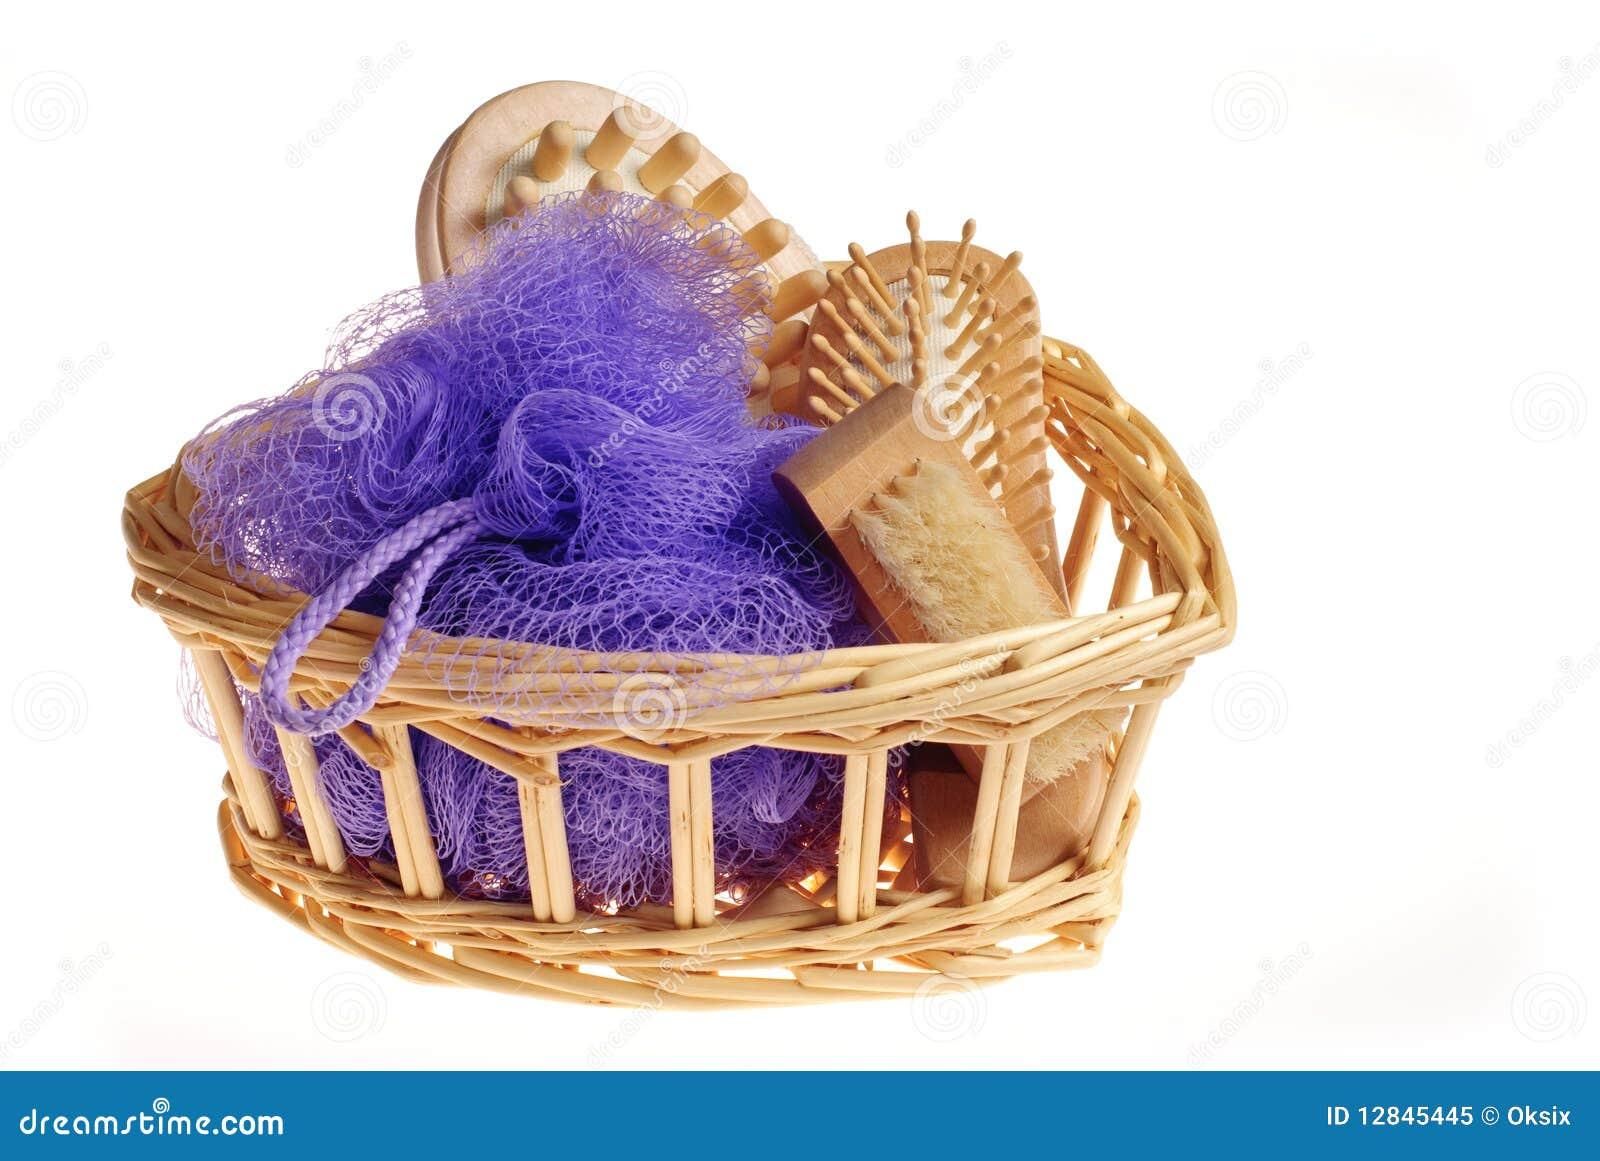 bath spa kit royalty free stock photo image 12845445